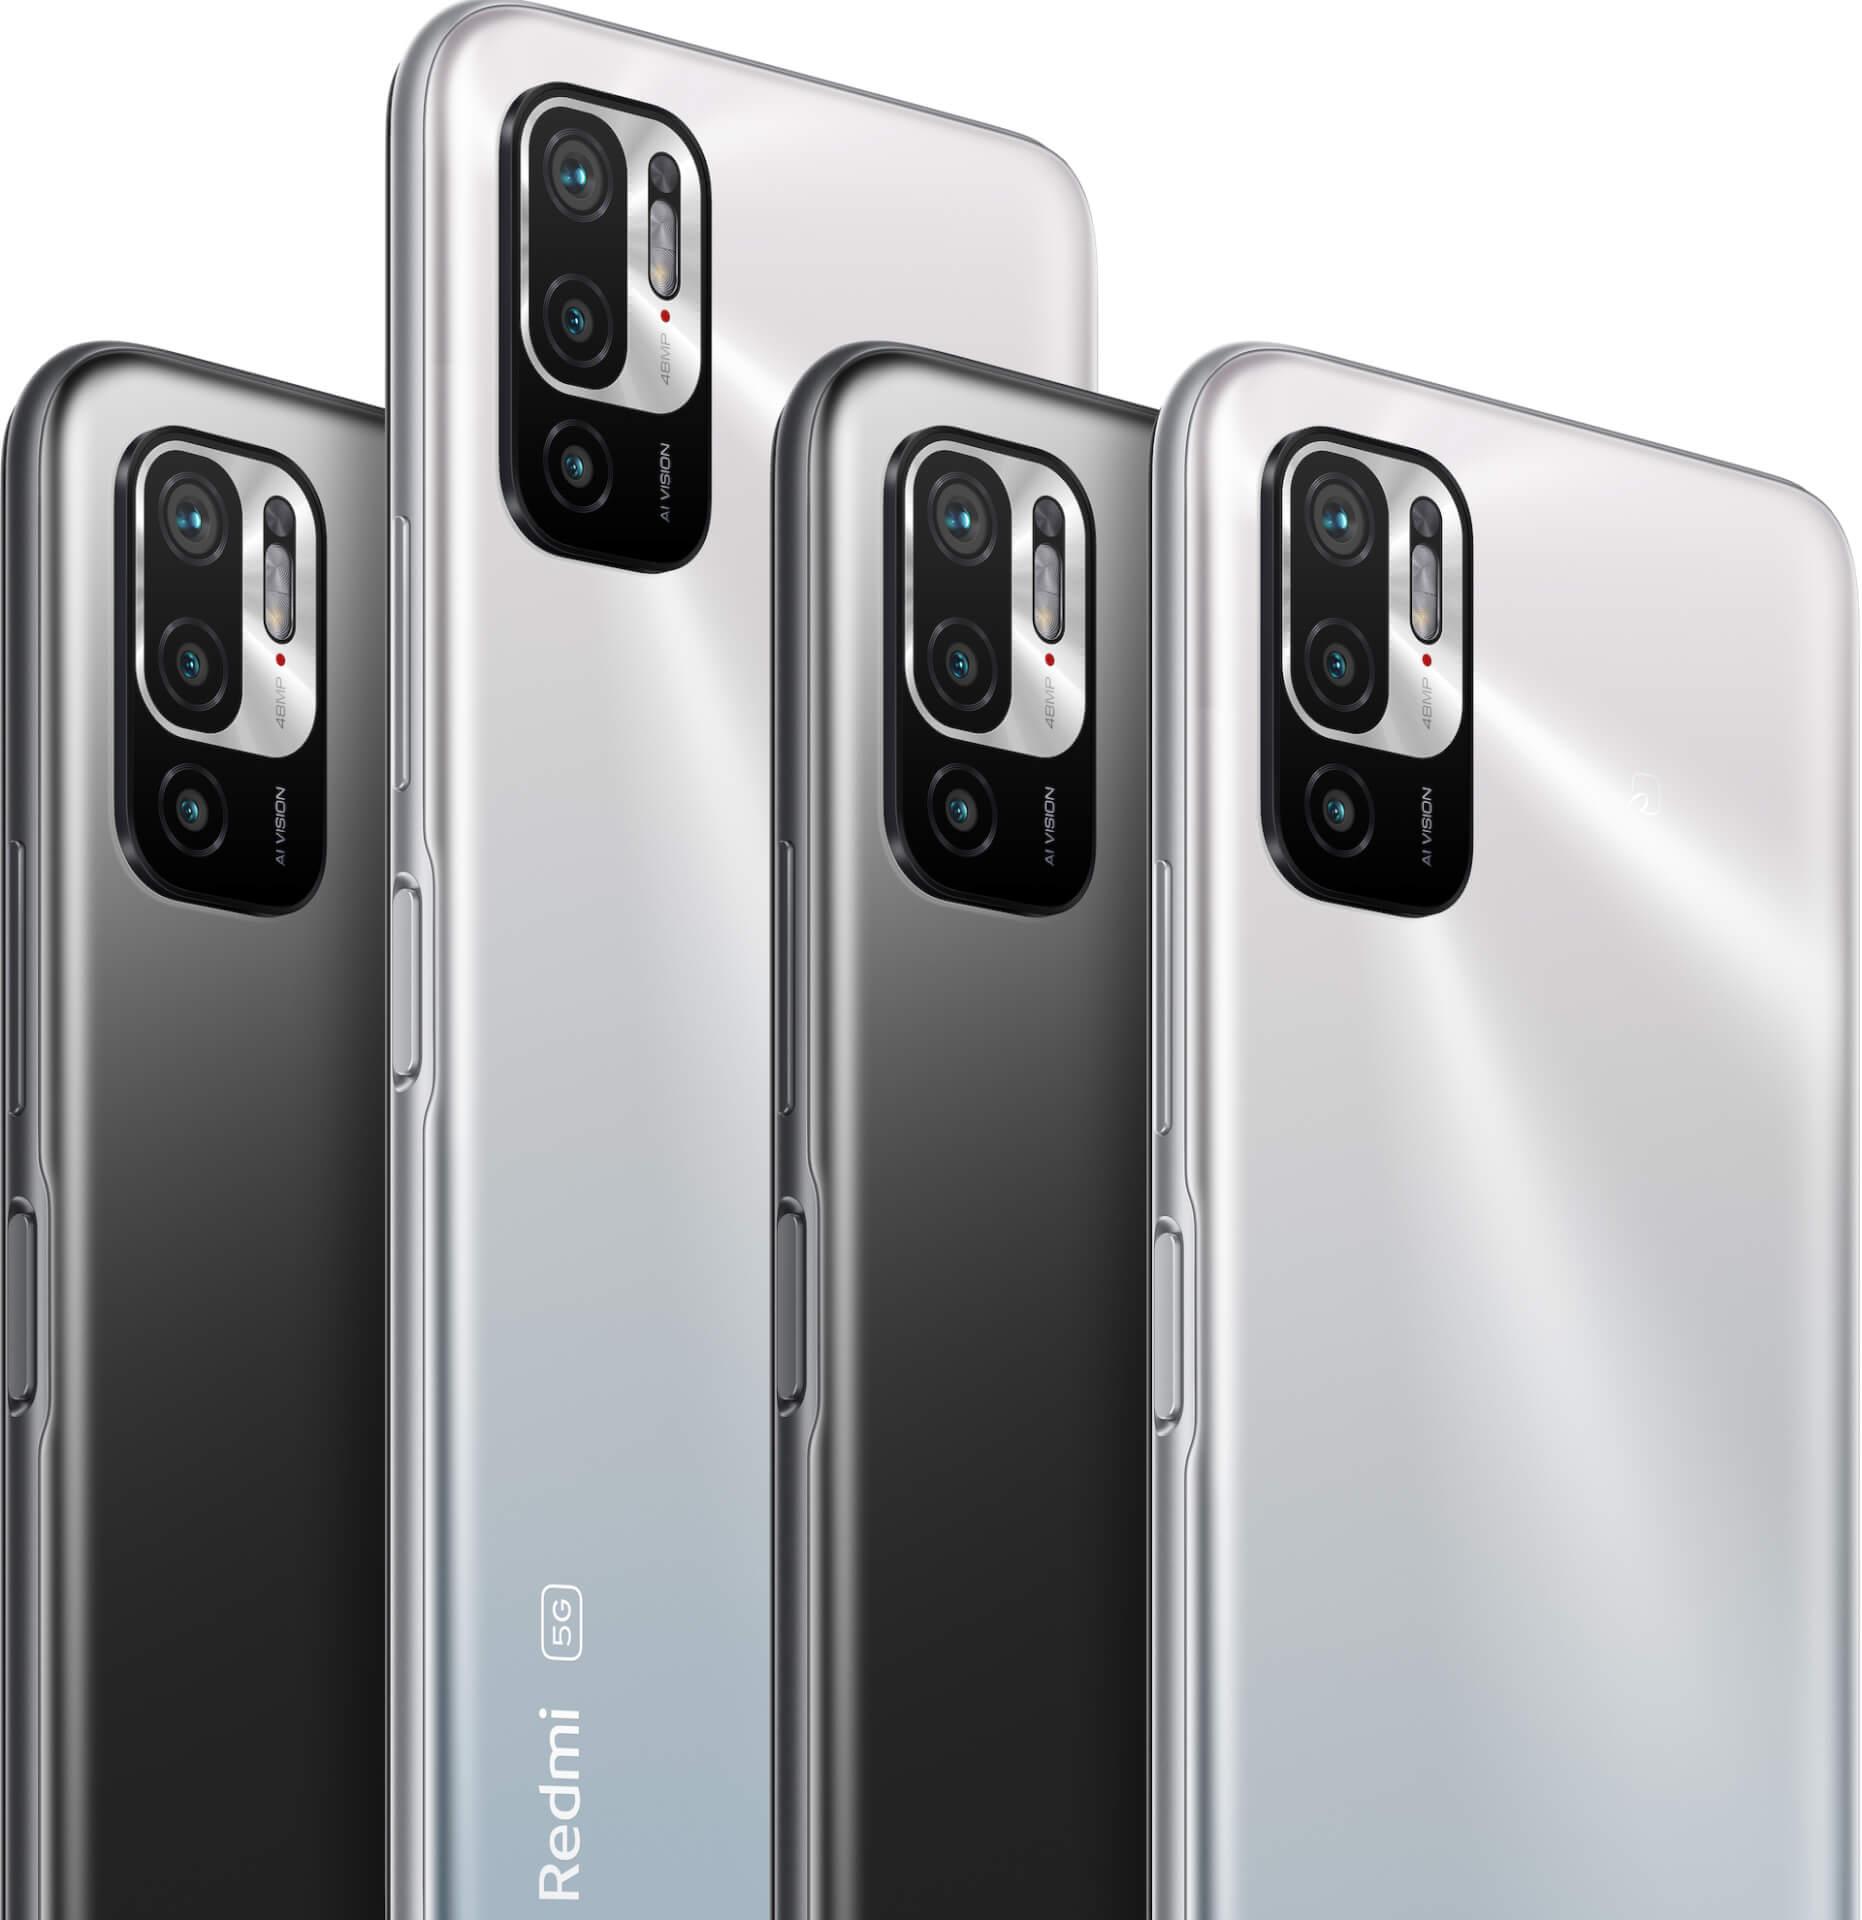 Xiaomiから初の日本独自モデルの5Gスマホ『Redmi Note 10 JE』が発売決定!AI顔認証、側面指紋認識センサーも搭載 tech210802_xiaomi_5g_4